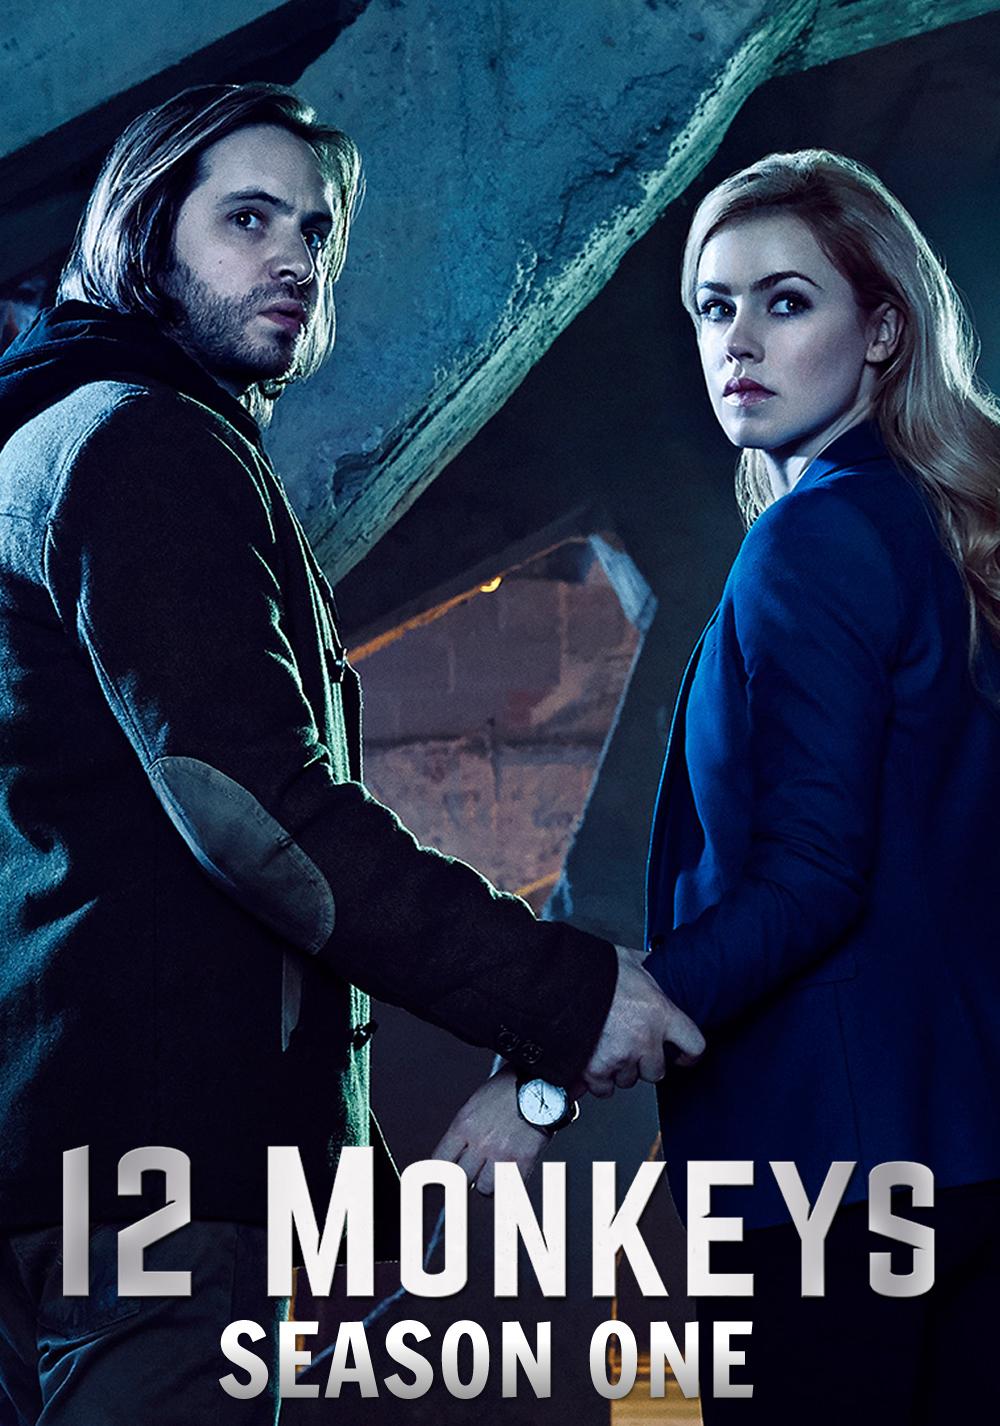 Twelve Monkeys Serie